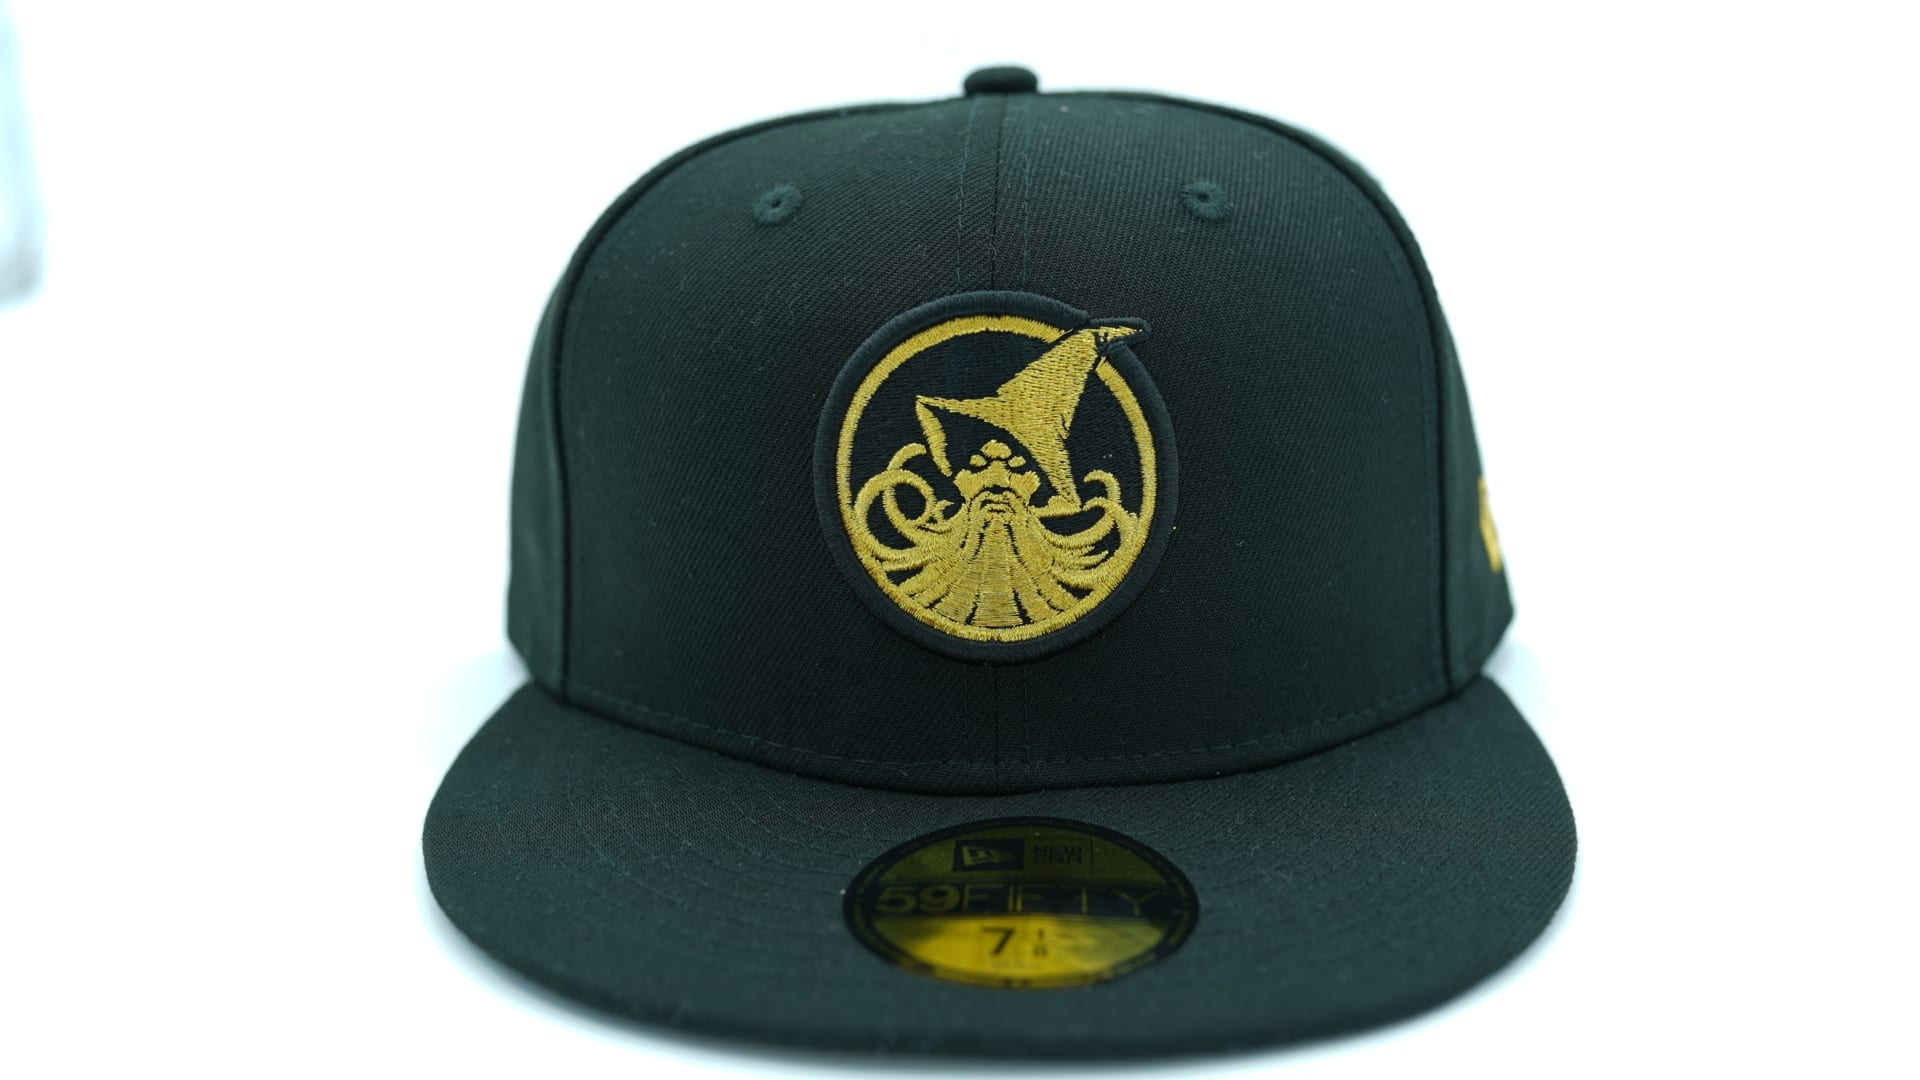 3db7903665e ... new zealand cleveland cavaliers cardinal 59fifty fitted baseball cap  new era nba 1 a6015 0030f ...